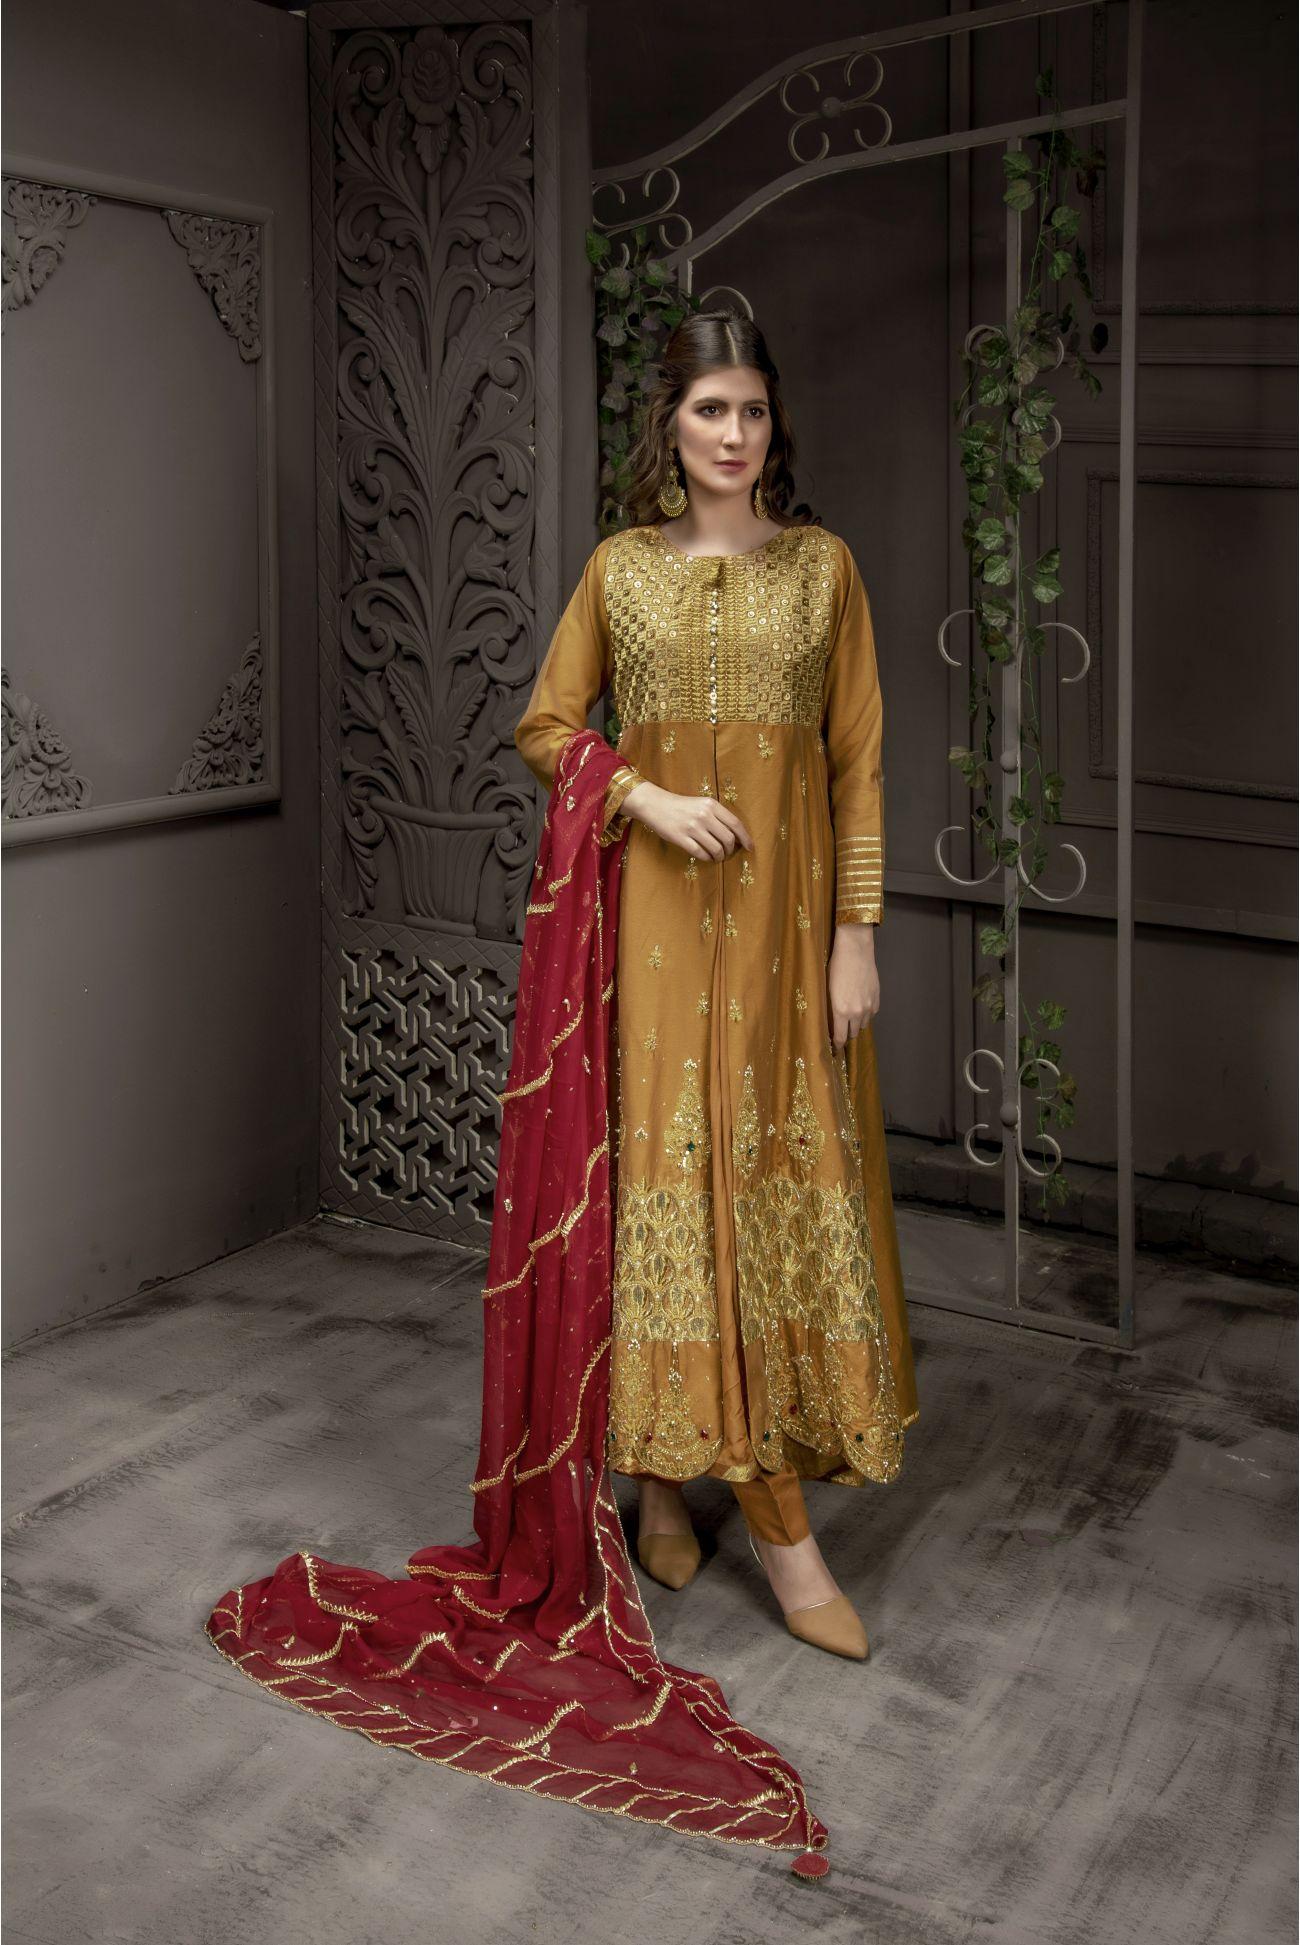 Buy Exclusive MUSAtard And Maroon Bridal Wear – Sabd218 Online In USA, Uk & Pakistan - 01